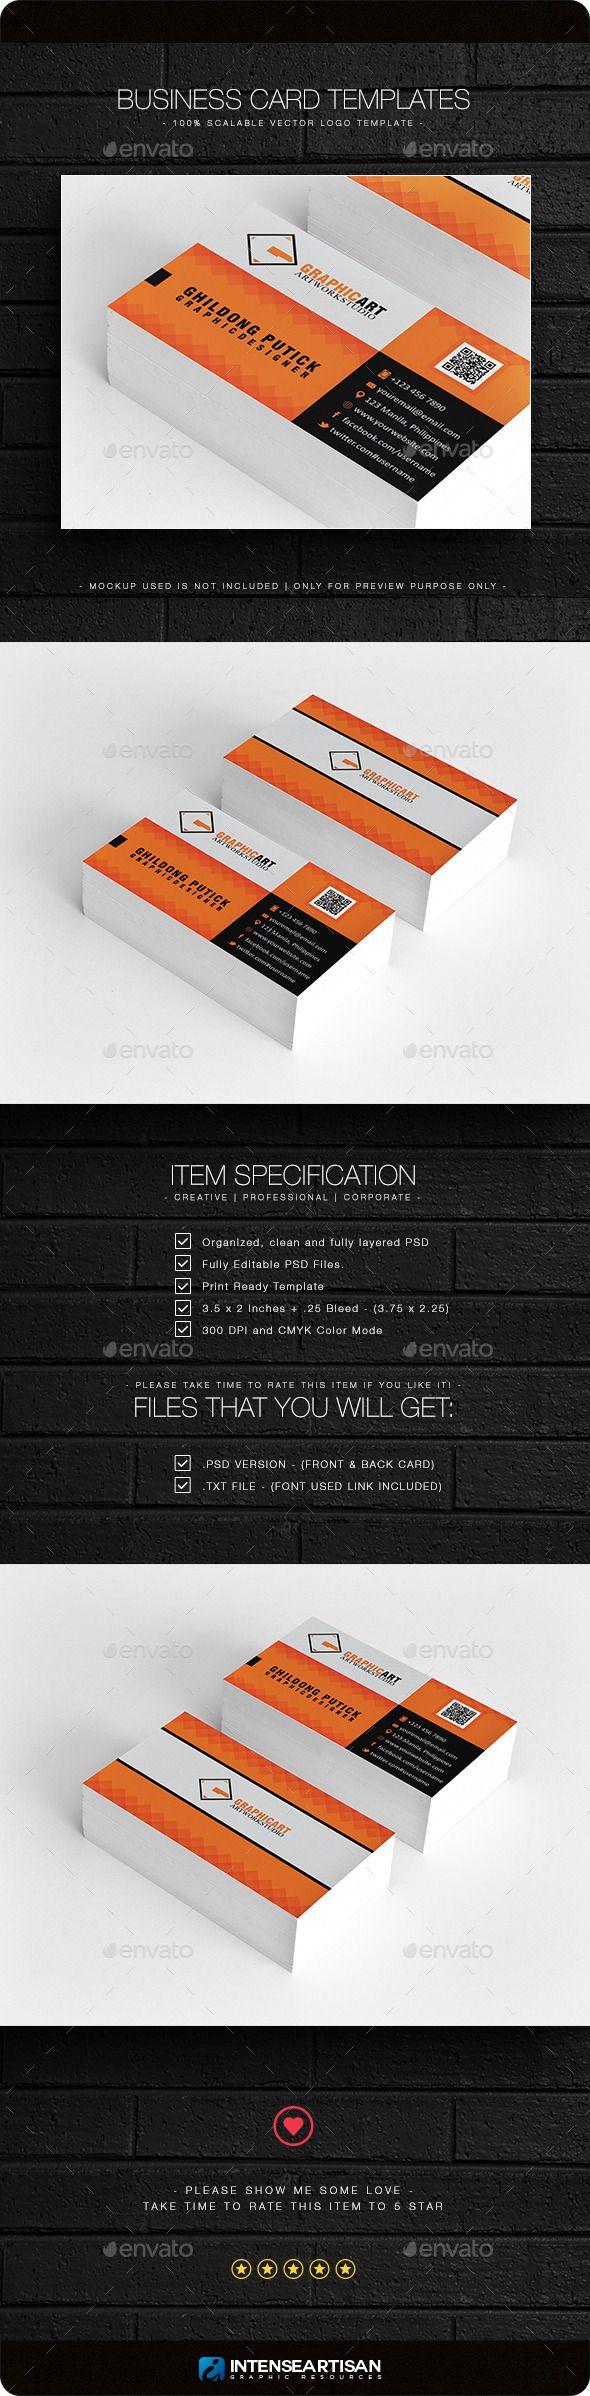 1470 best Minimal Business Card Design images on Pinterest ...